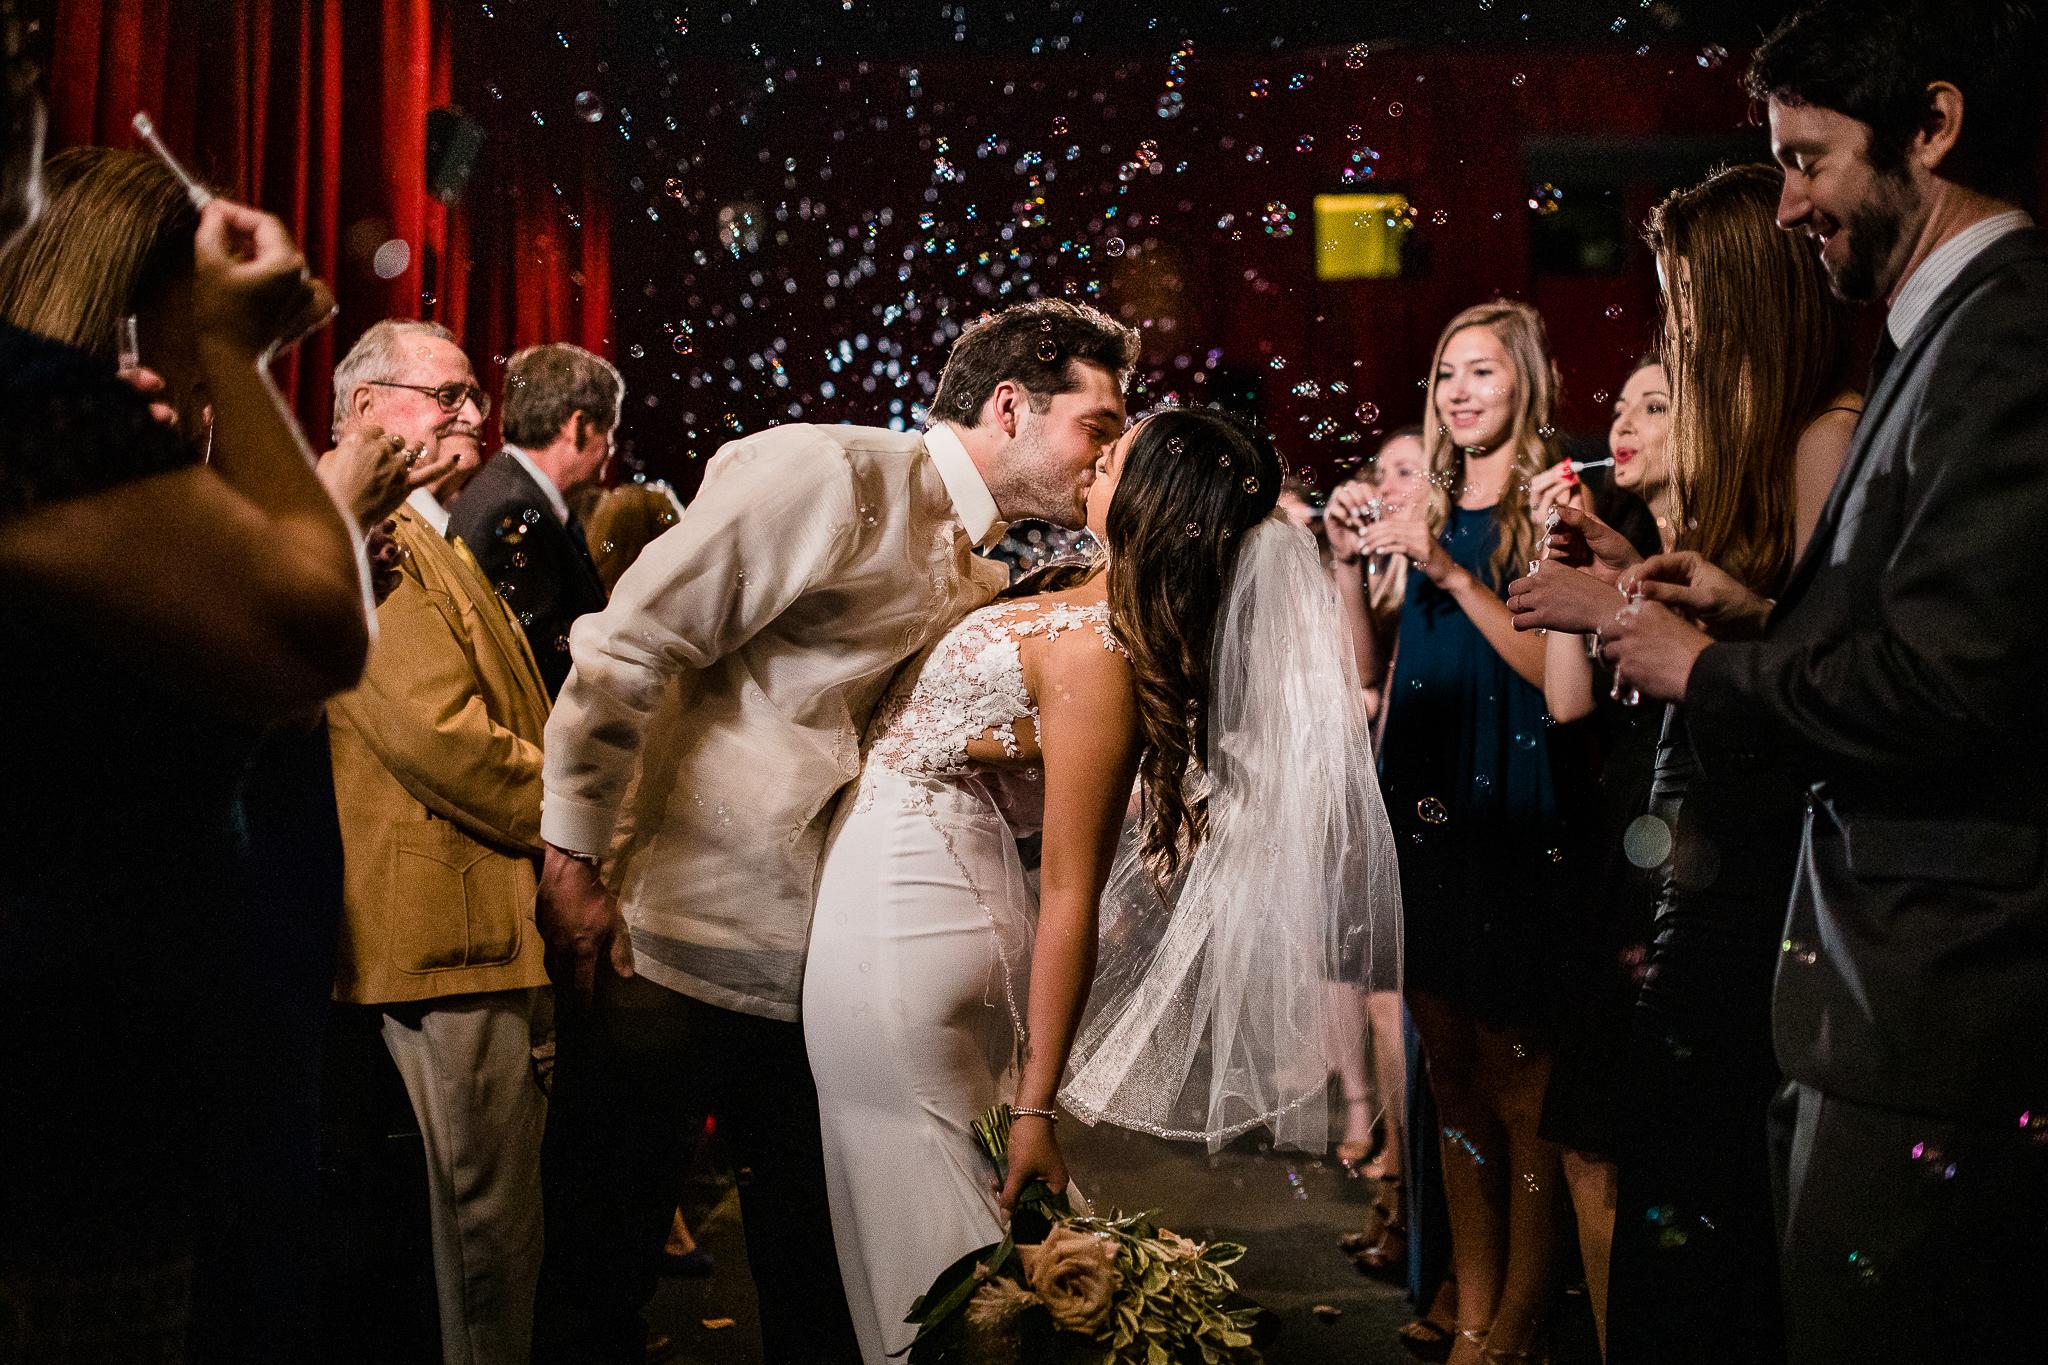 john winters photography best austin wedding photographer couple bubble exit austin film society wedding